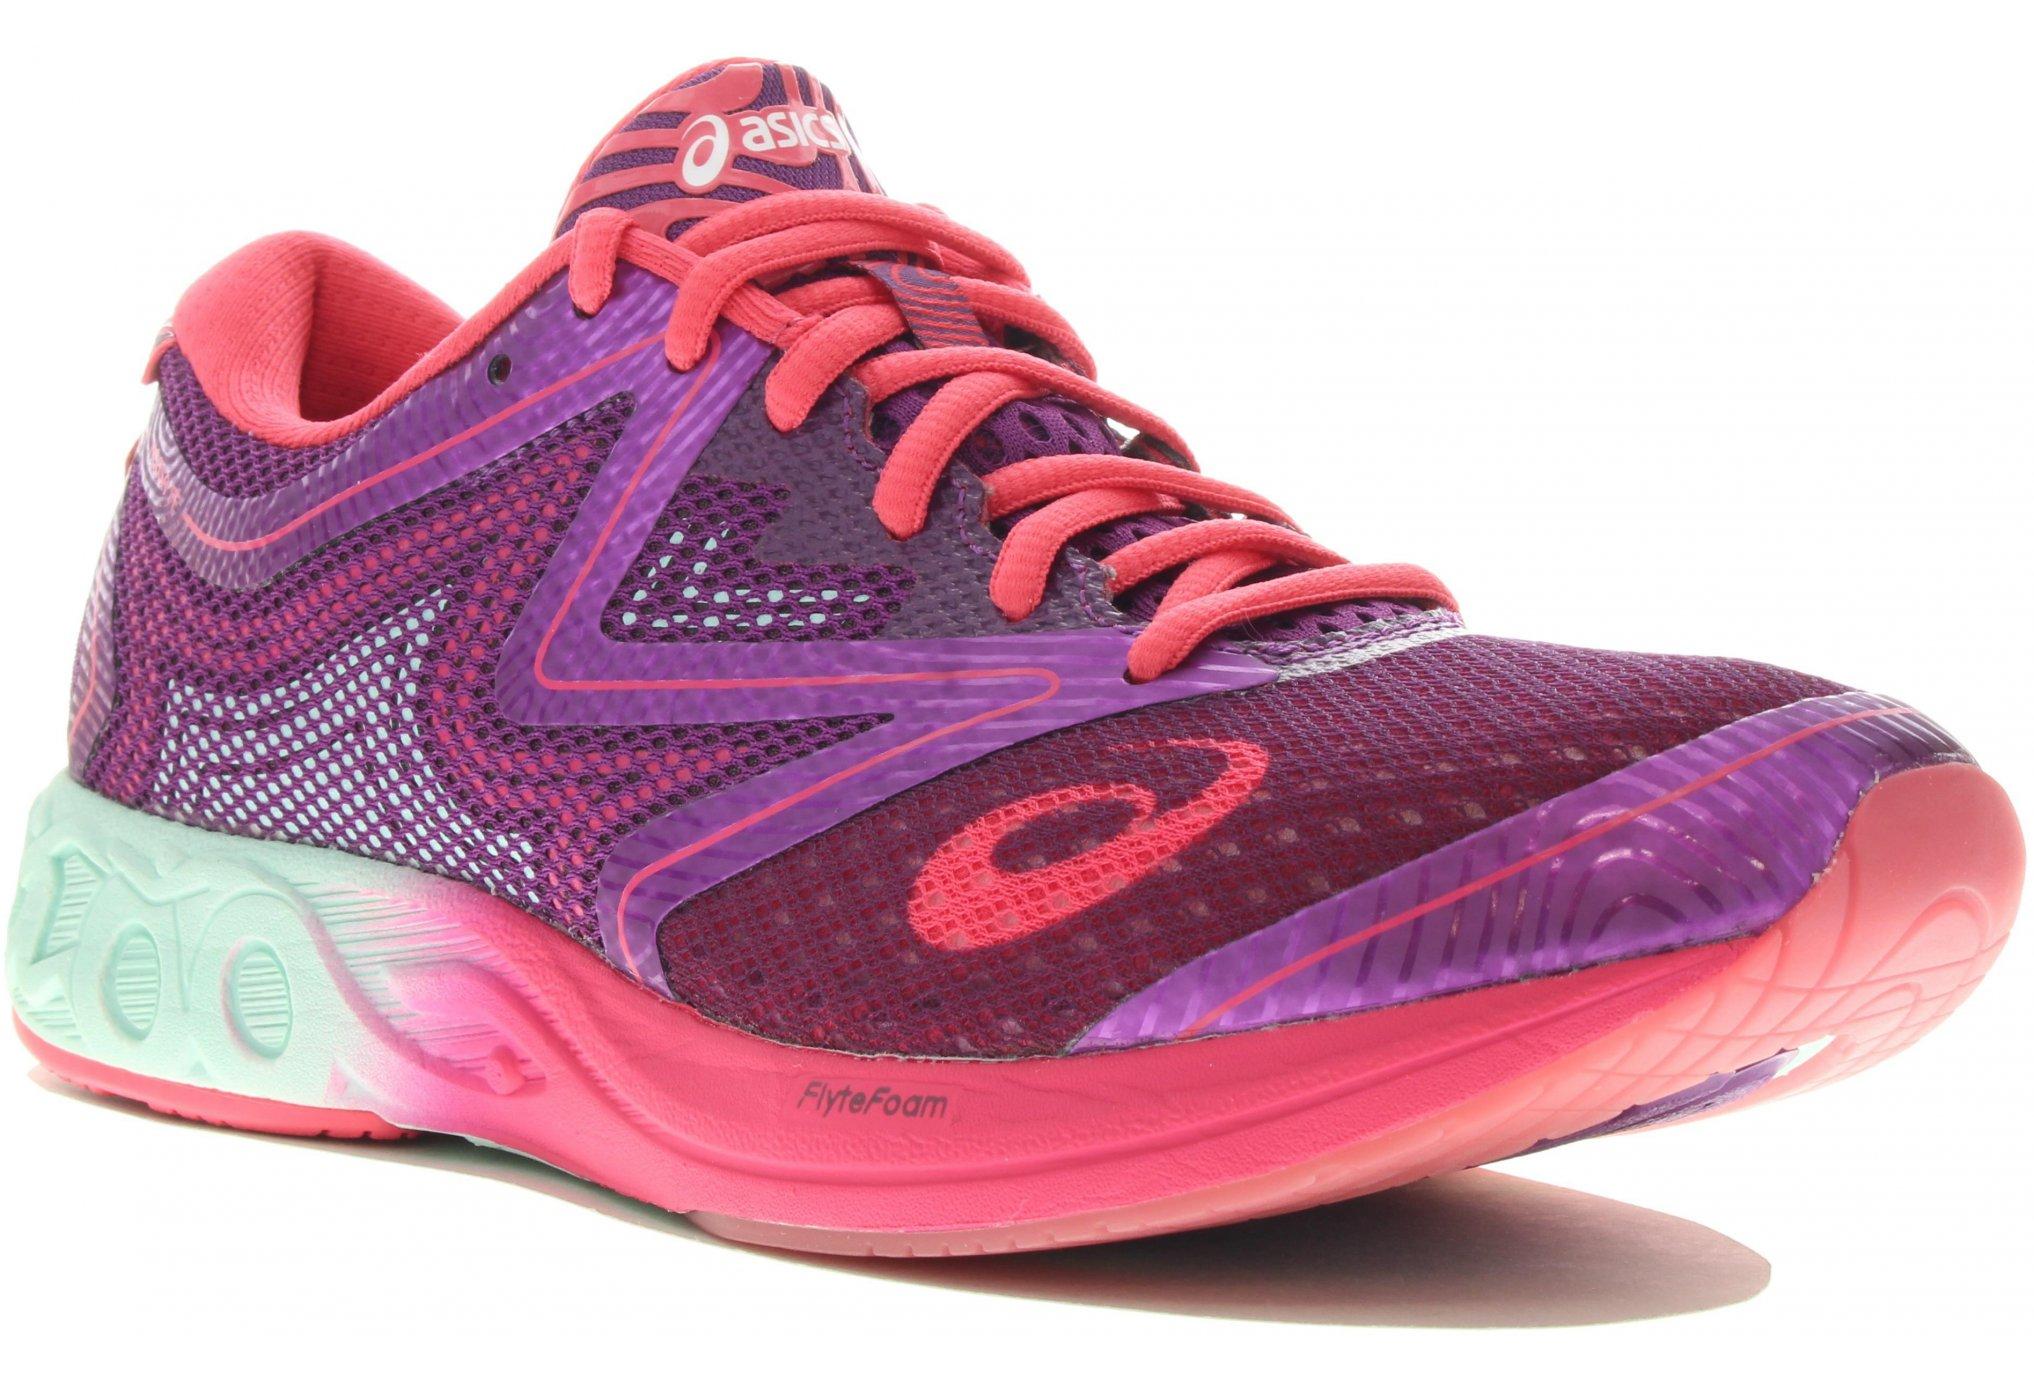 81799225365 W Cumulus femme Trail 19 Session running Gel Chaussures Asics Hp6xTqB